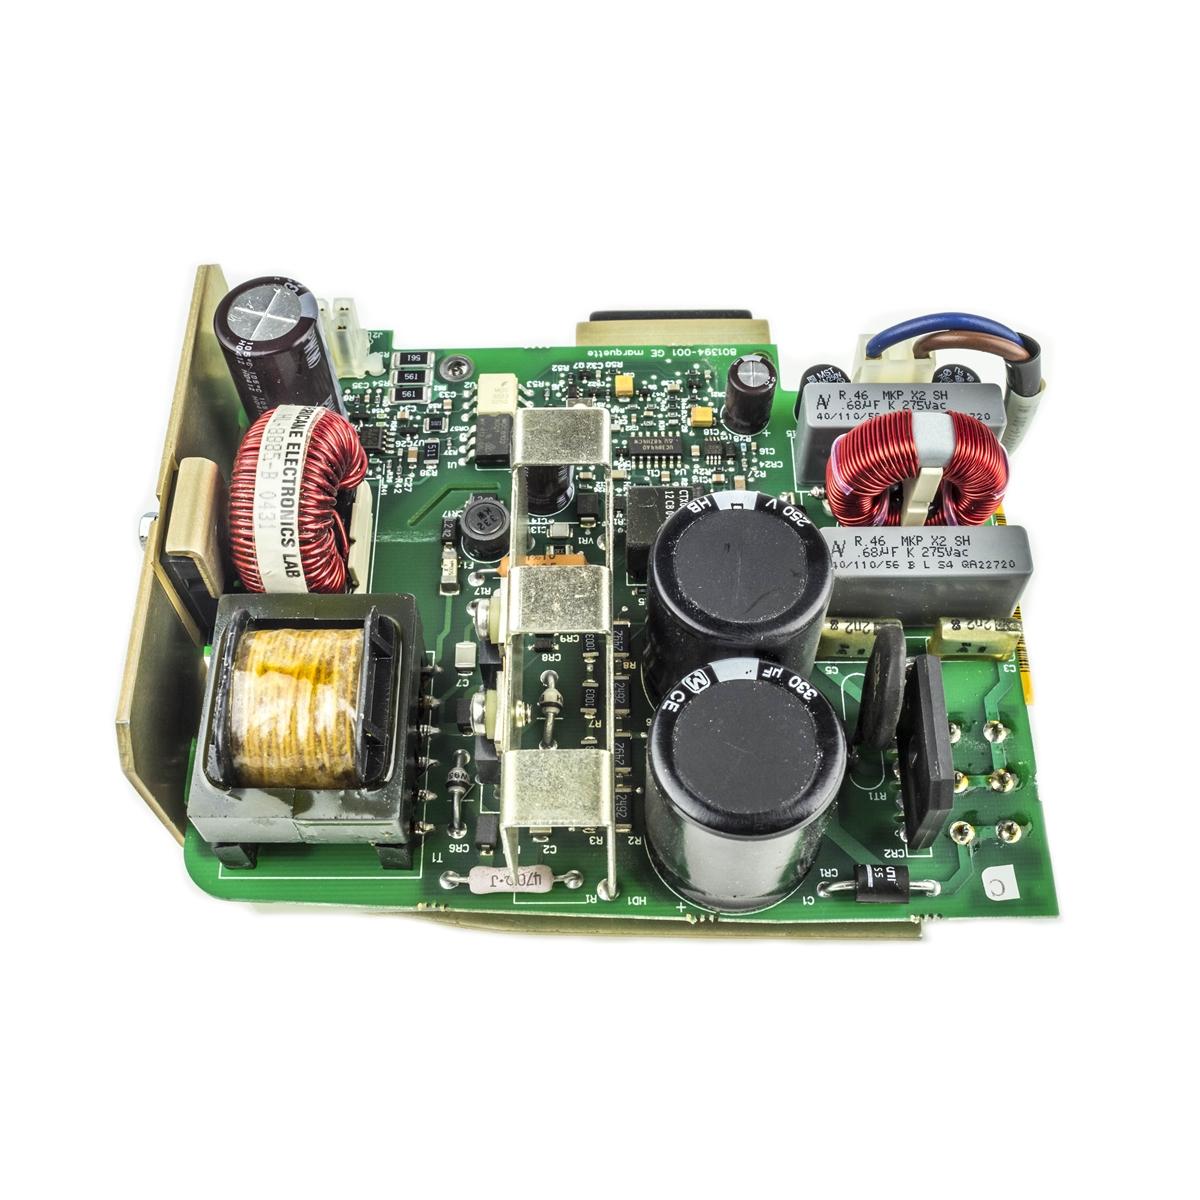 Ge Dash 3000 4000 5000 Patient Monitor Power Supply Circuit Board Lowcostvoltageregulator Powersupplycircuit Diagram Bracket